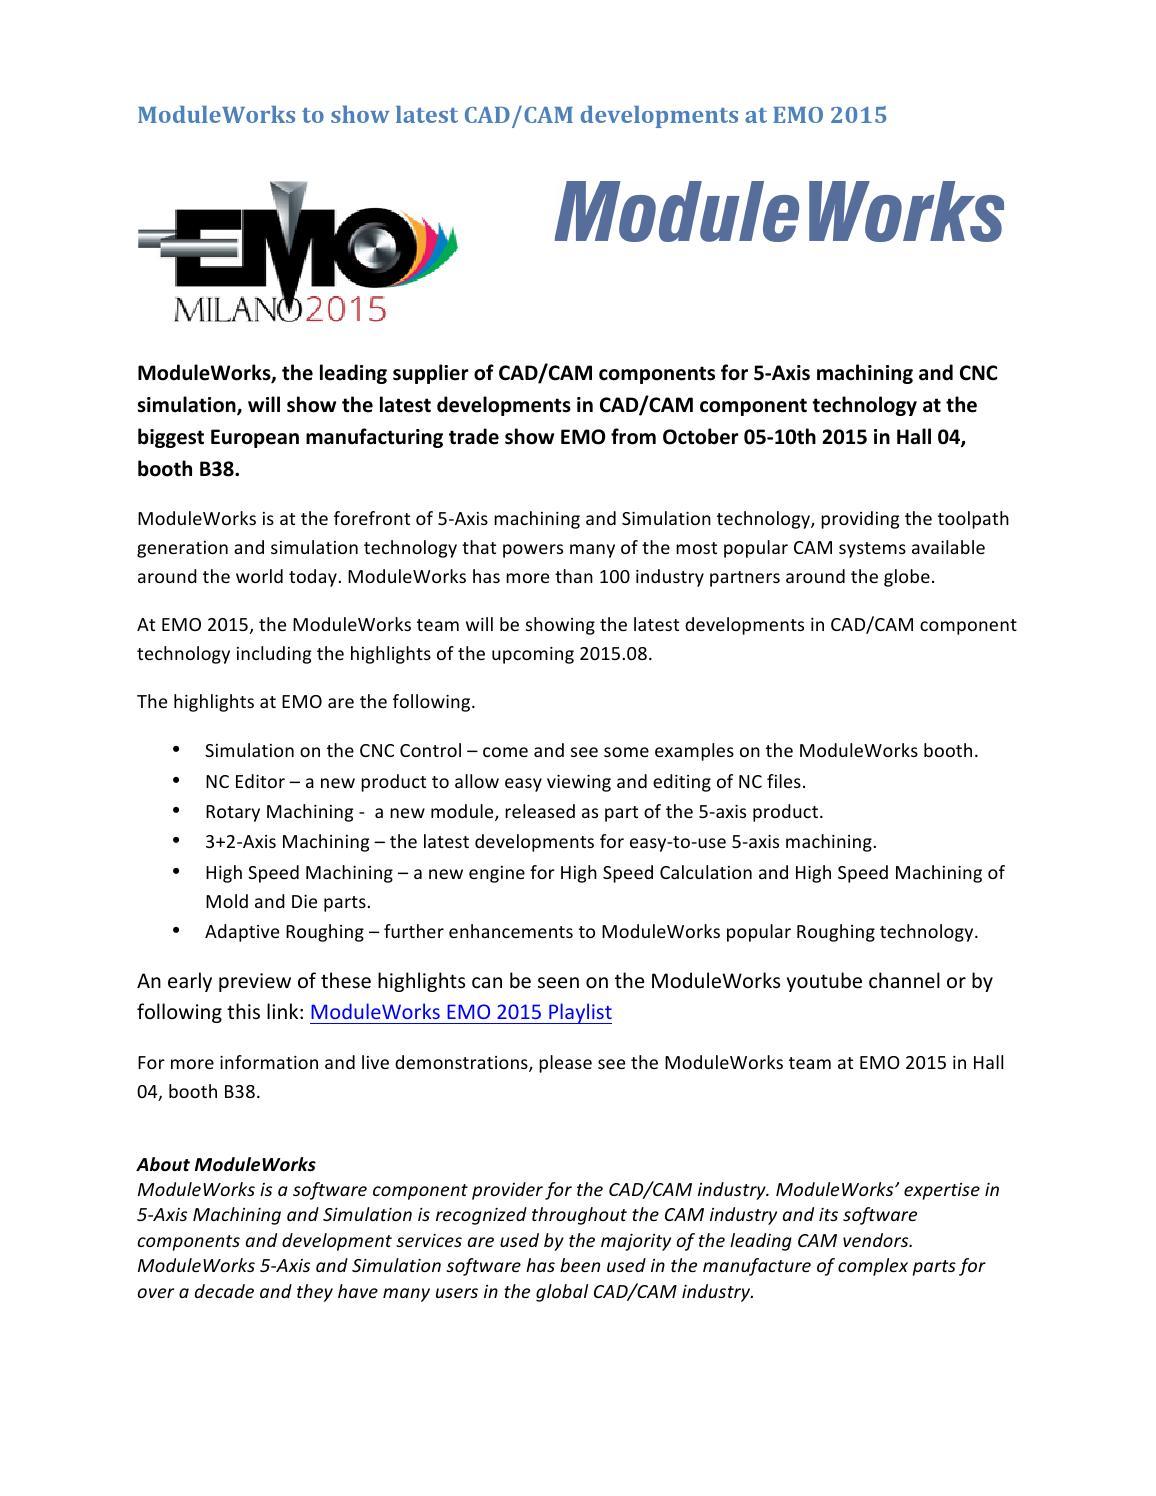 Moduleworks Press Release